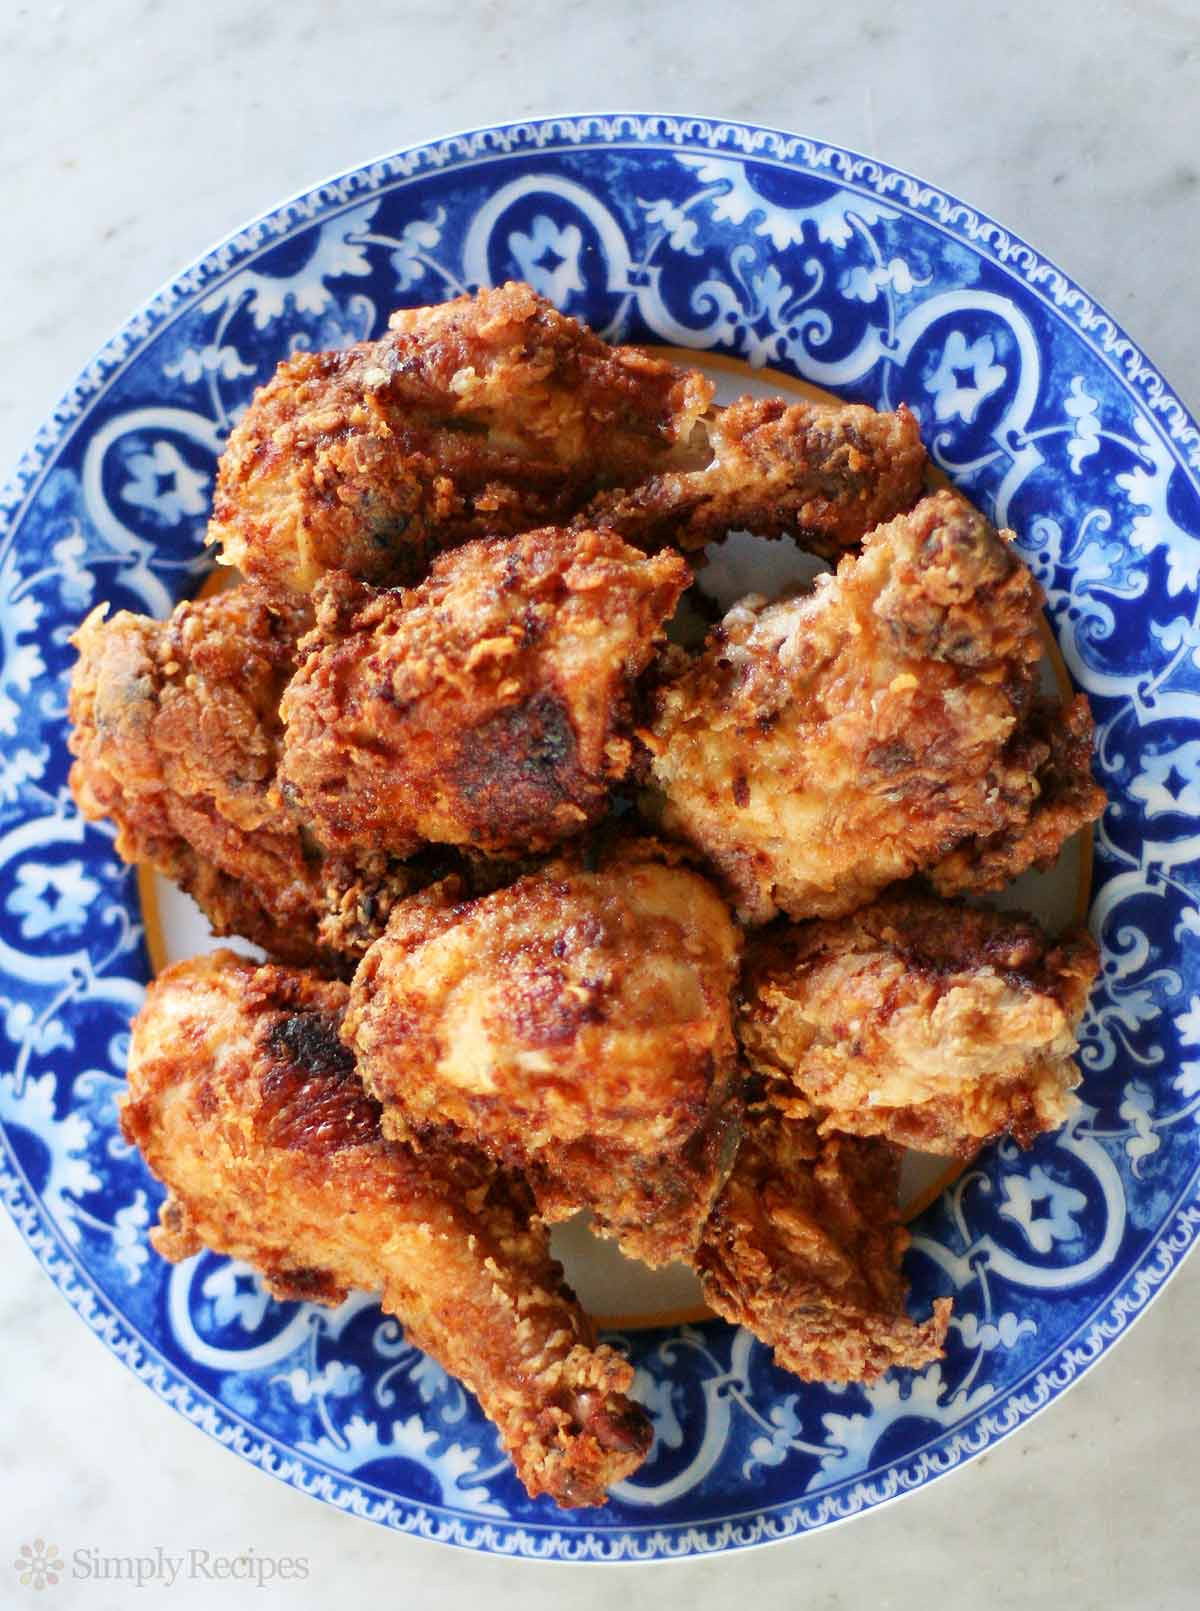 Fried Chicken Recipes  Buttermilk Fried Chicken Recipe